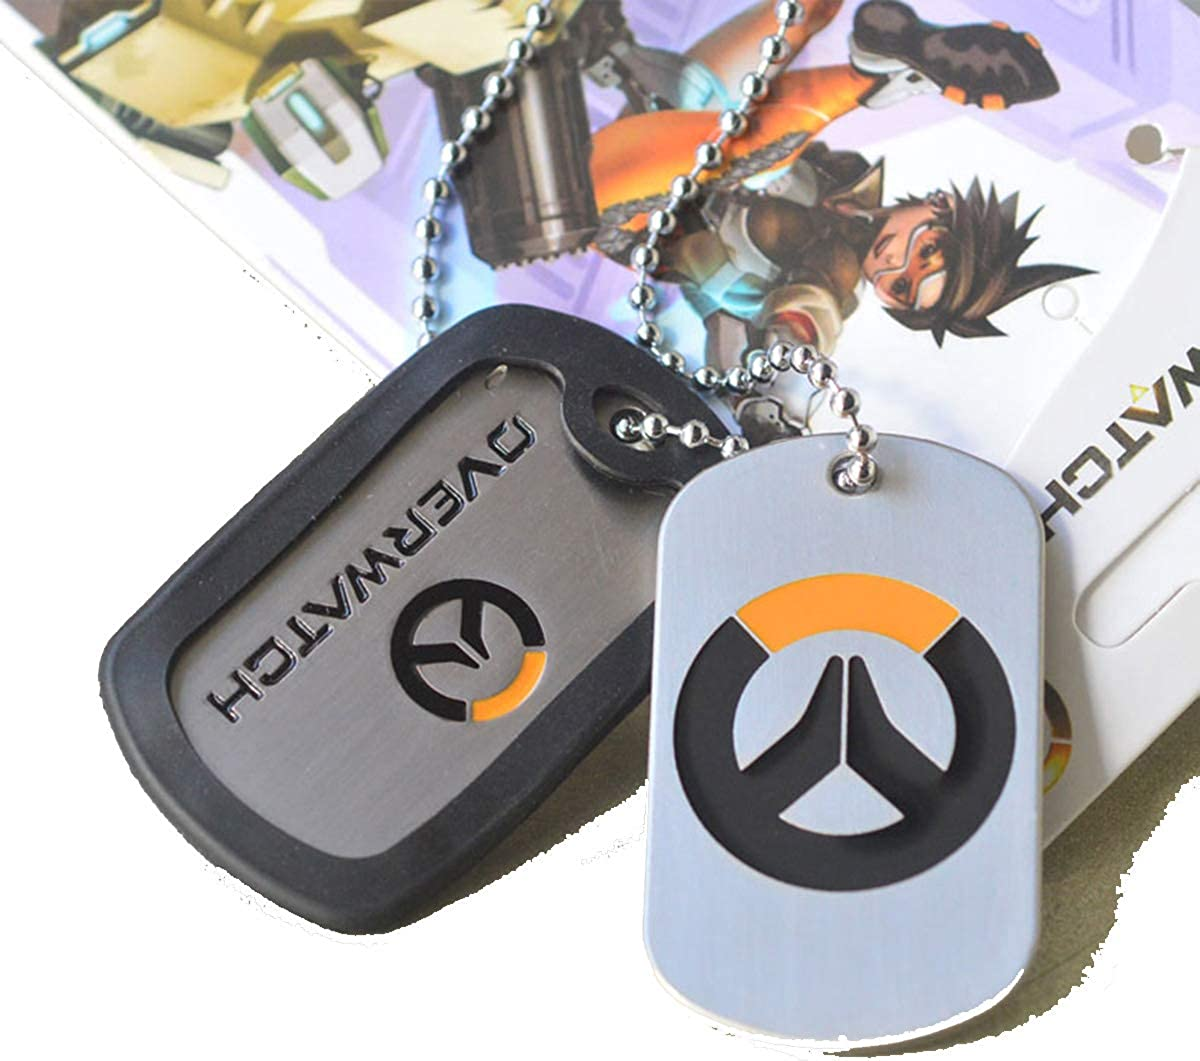 Baoleiju - Collar con Logotipo Overwatch con Colgante de Doble Etiqueta con Caja de Joyas, Collar Overwatch para niños, niñas (Plata): Amazon.es: Joyería